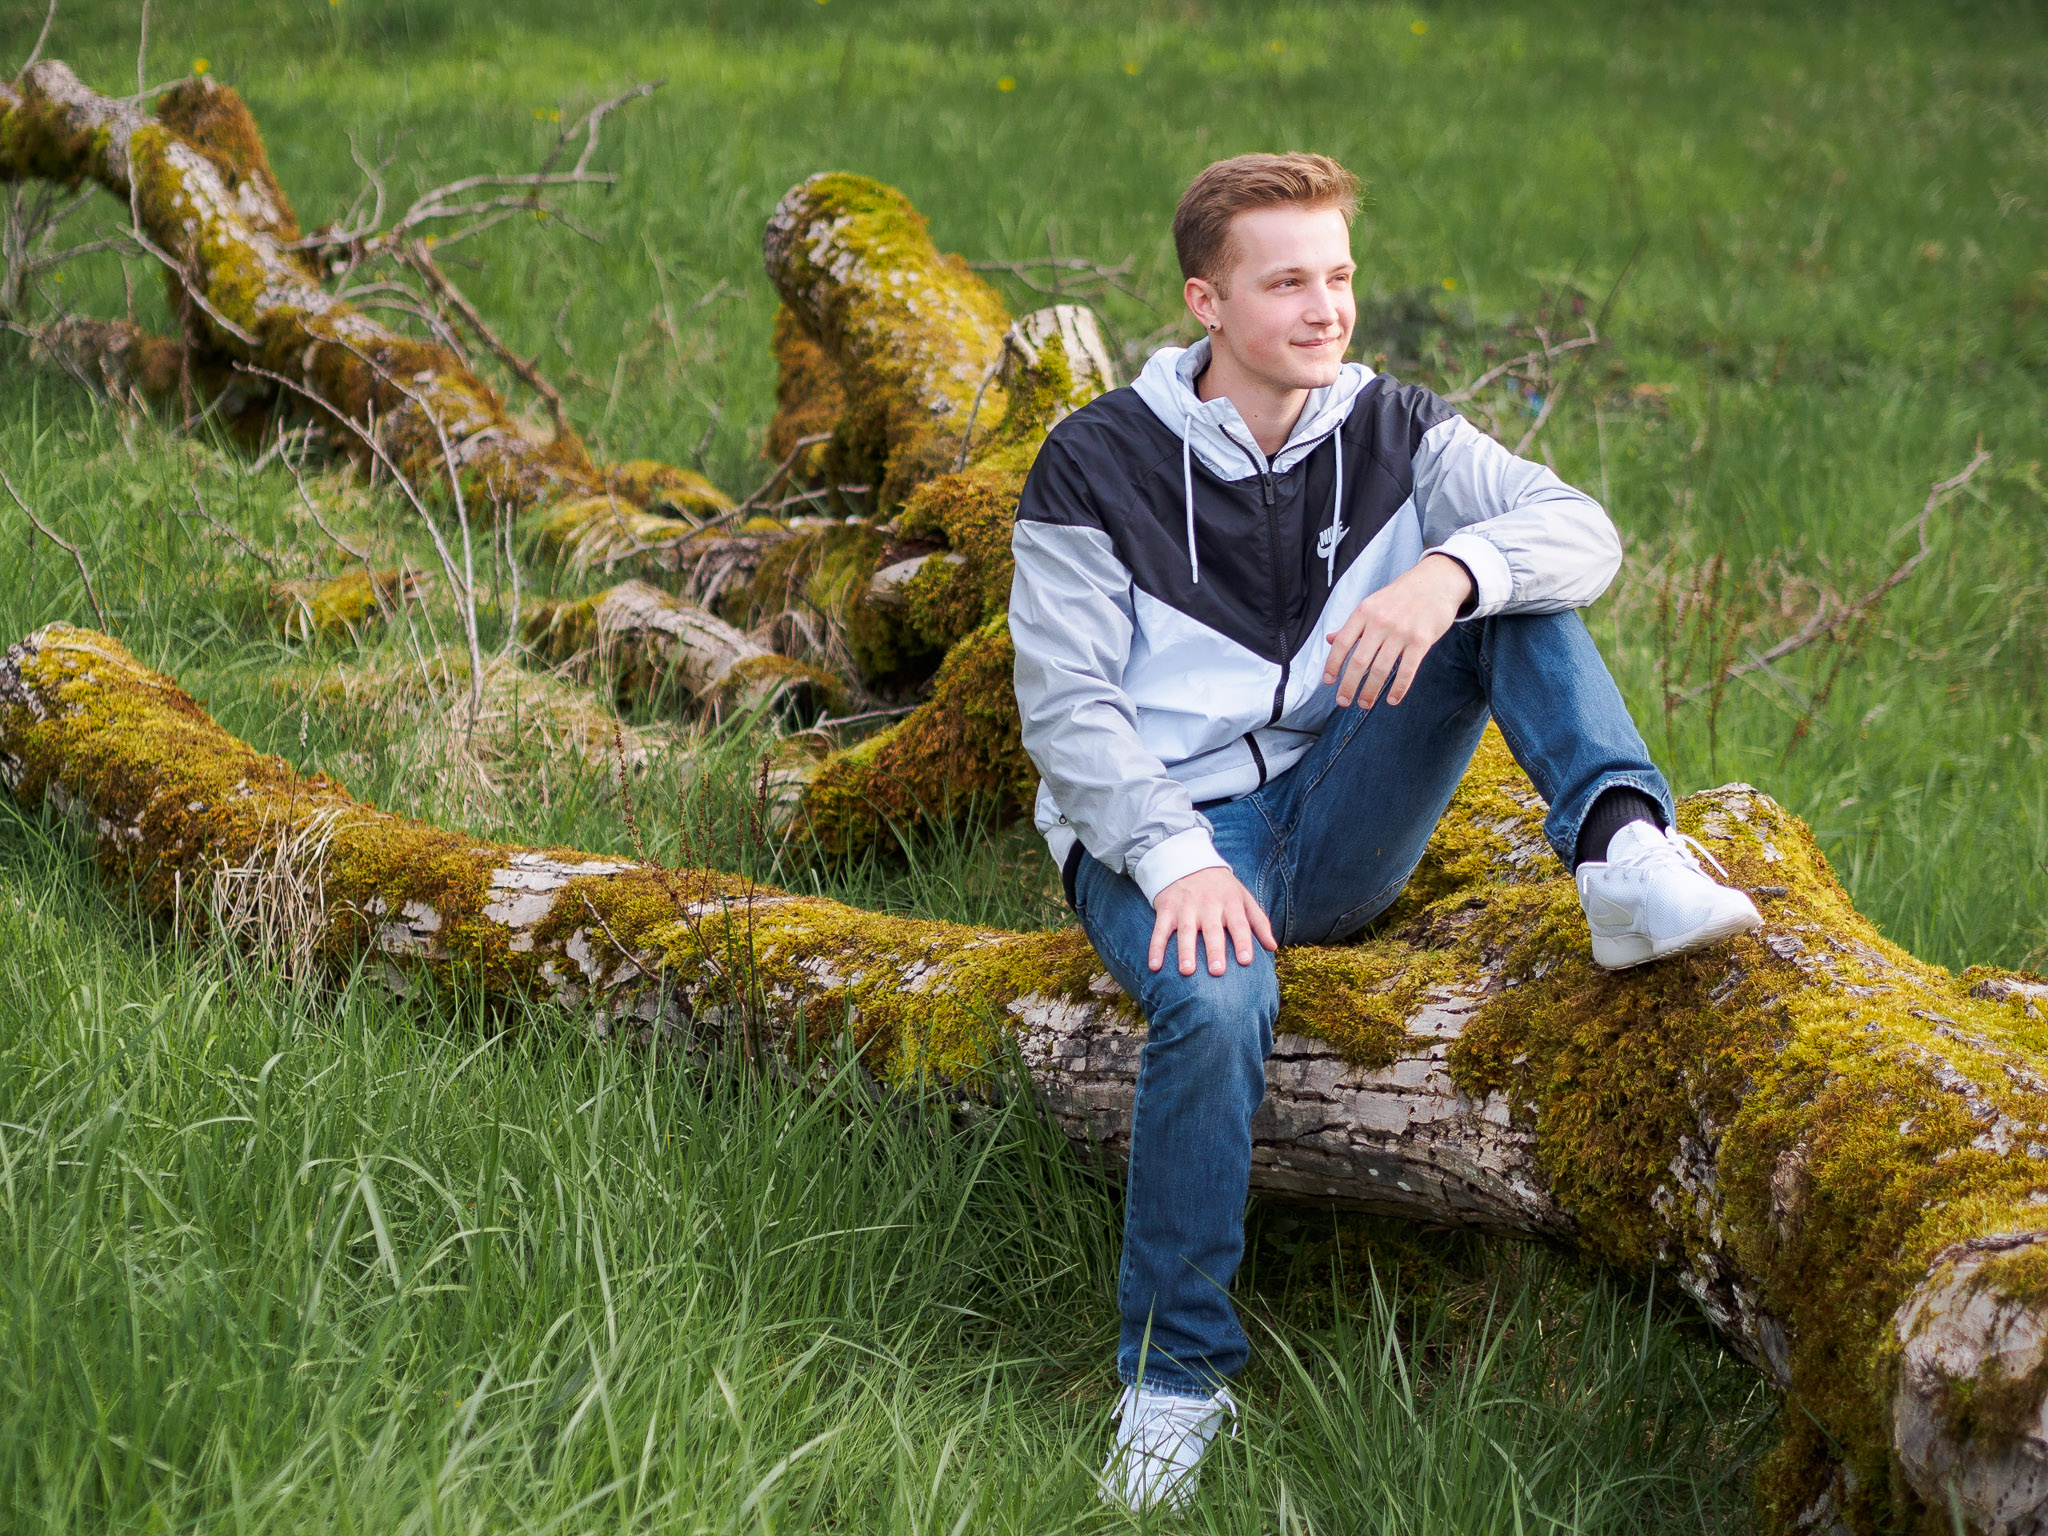 High School Senior Photographer Orange County CA-6.jpg